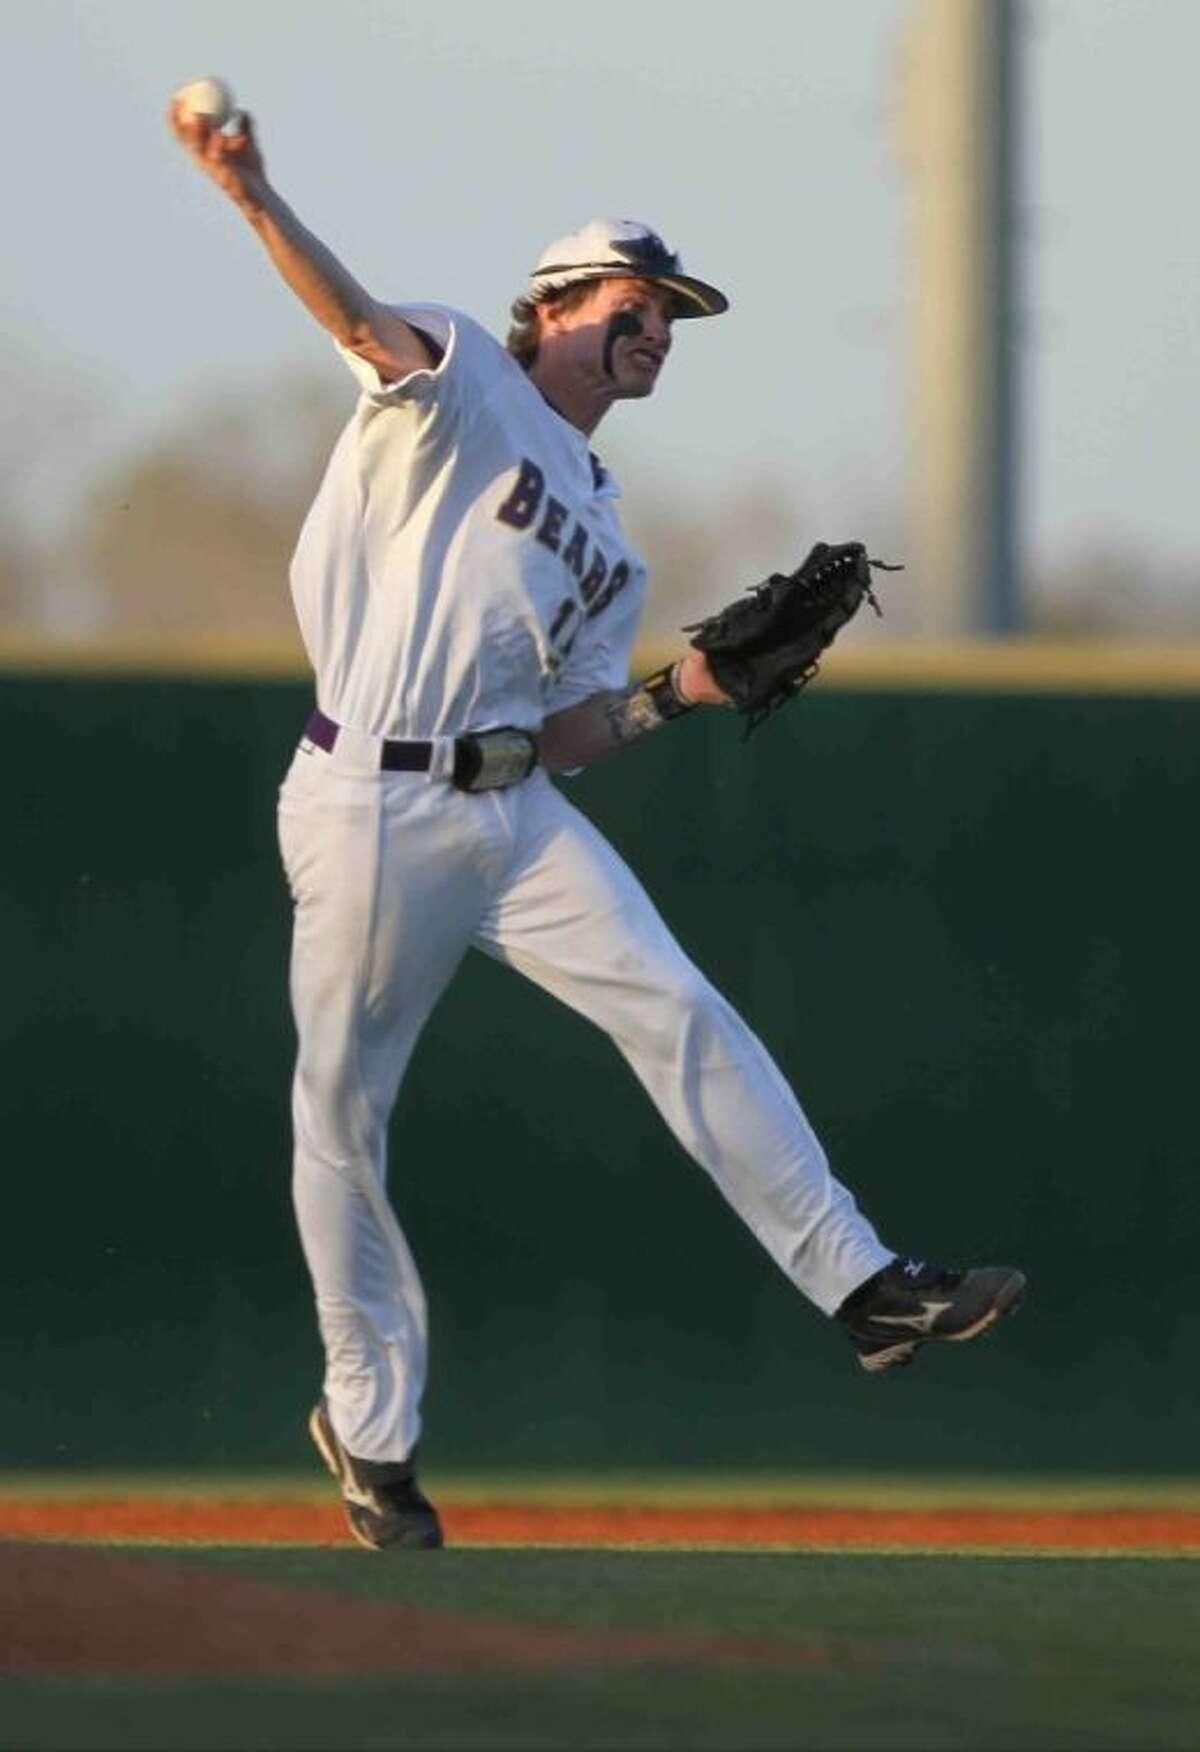 Montgomery senior shortstop Garrett Hrozek is the Courier's Defensive Player of the Year.